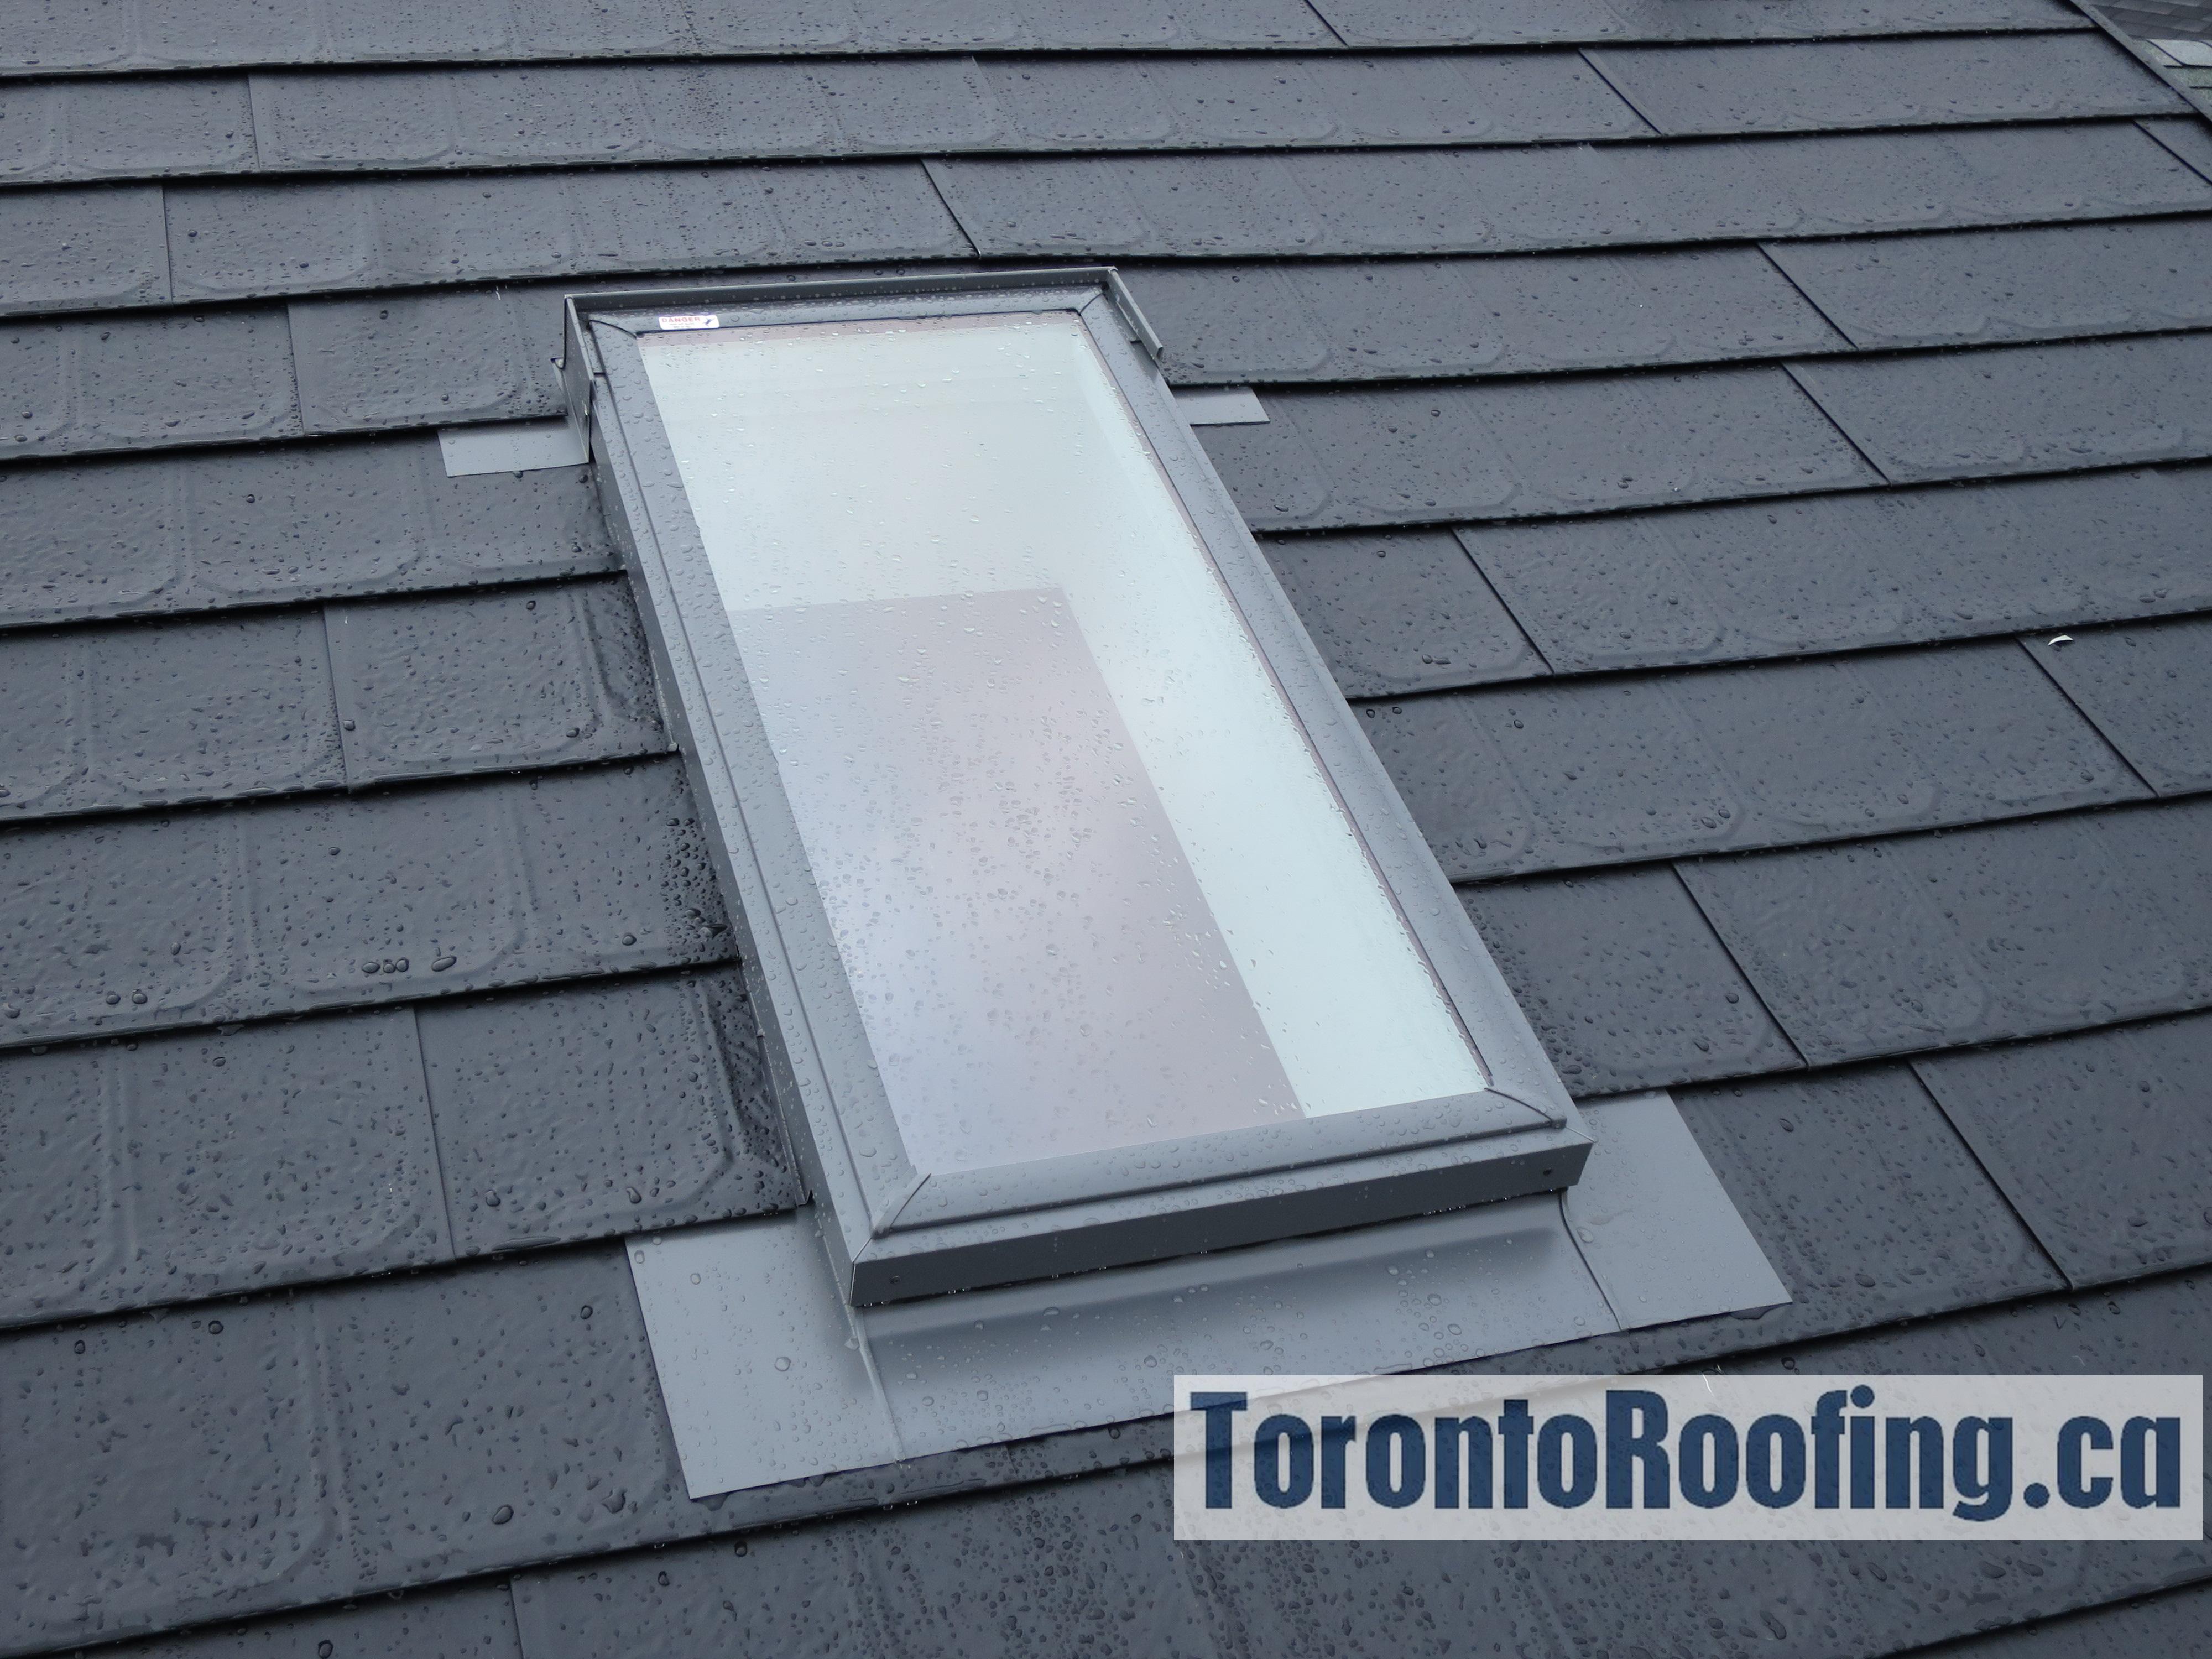 Metal Shingles Toronto Roofing